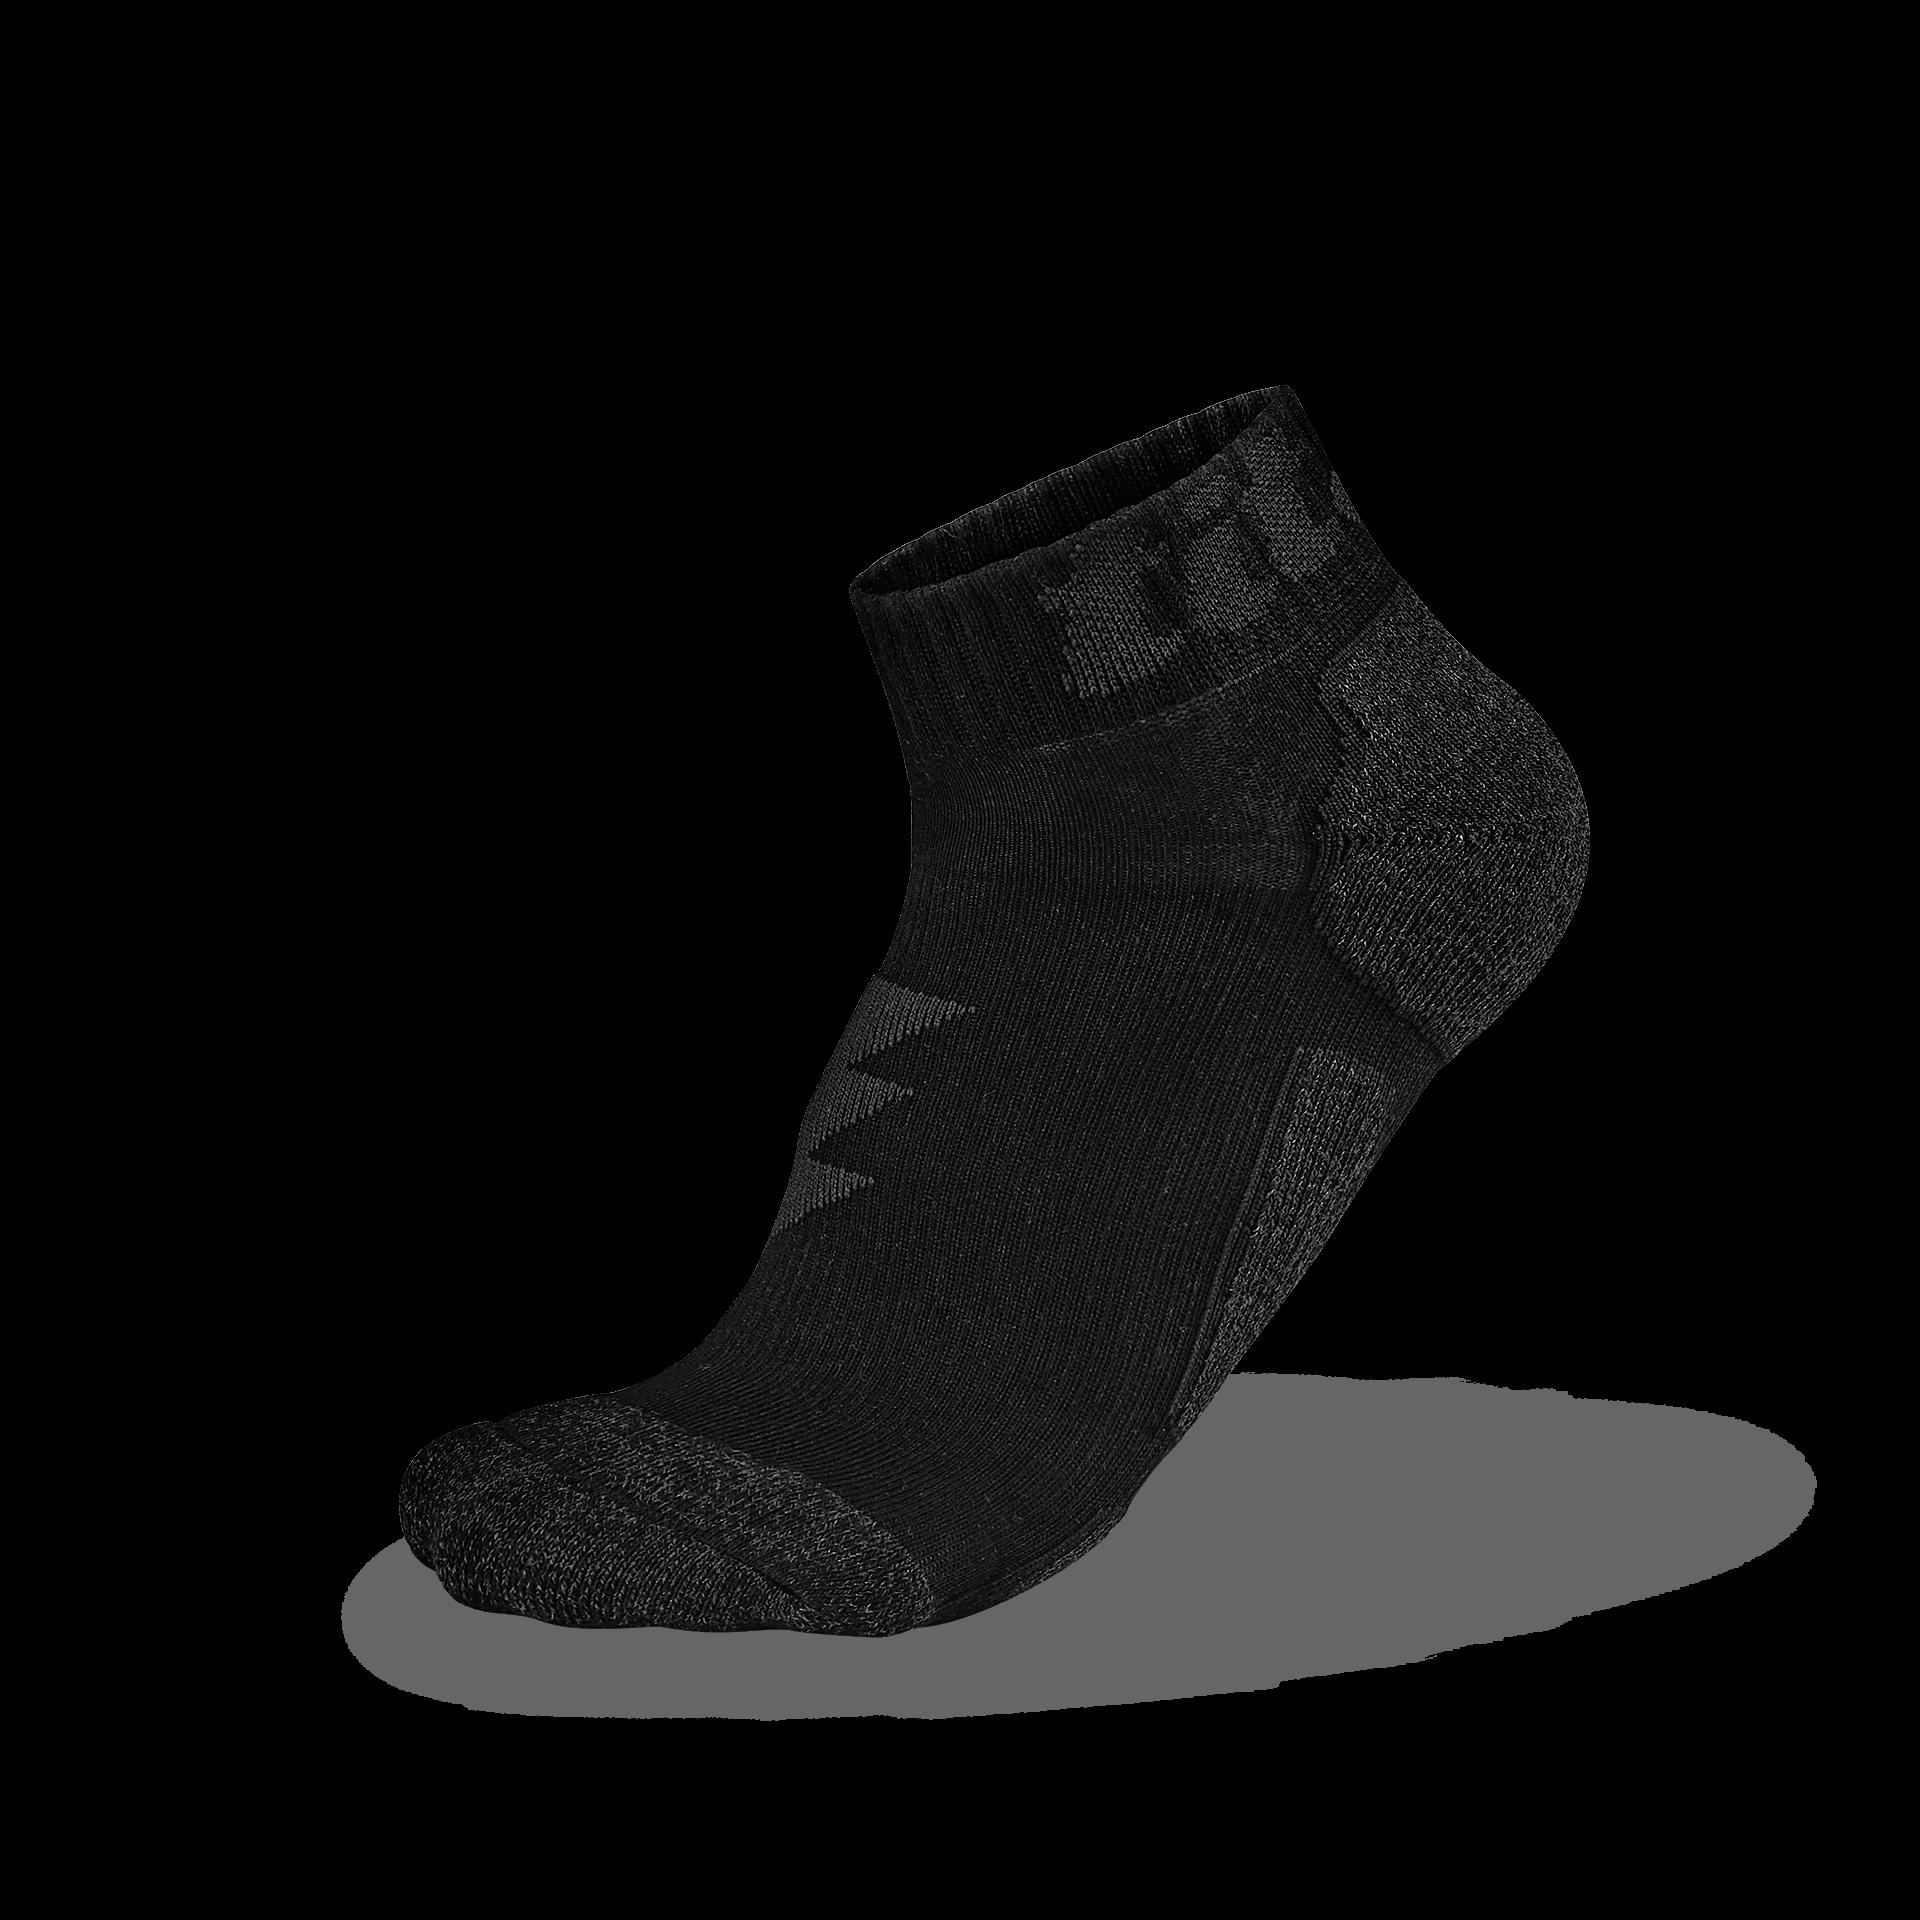 功能慢跑襪-閃電